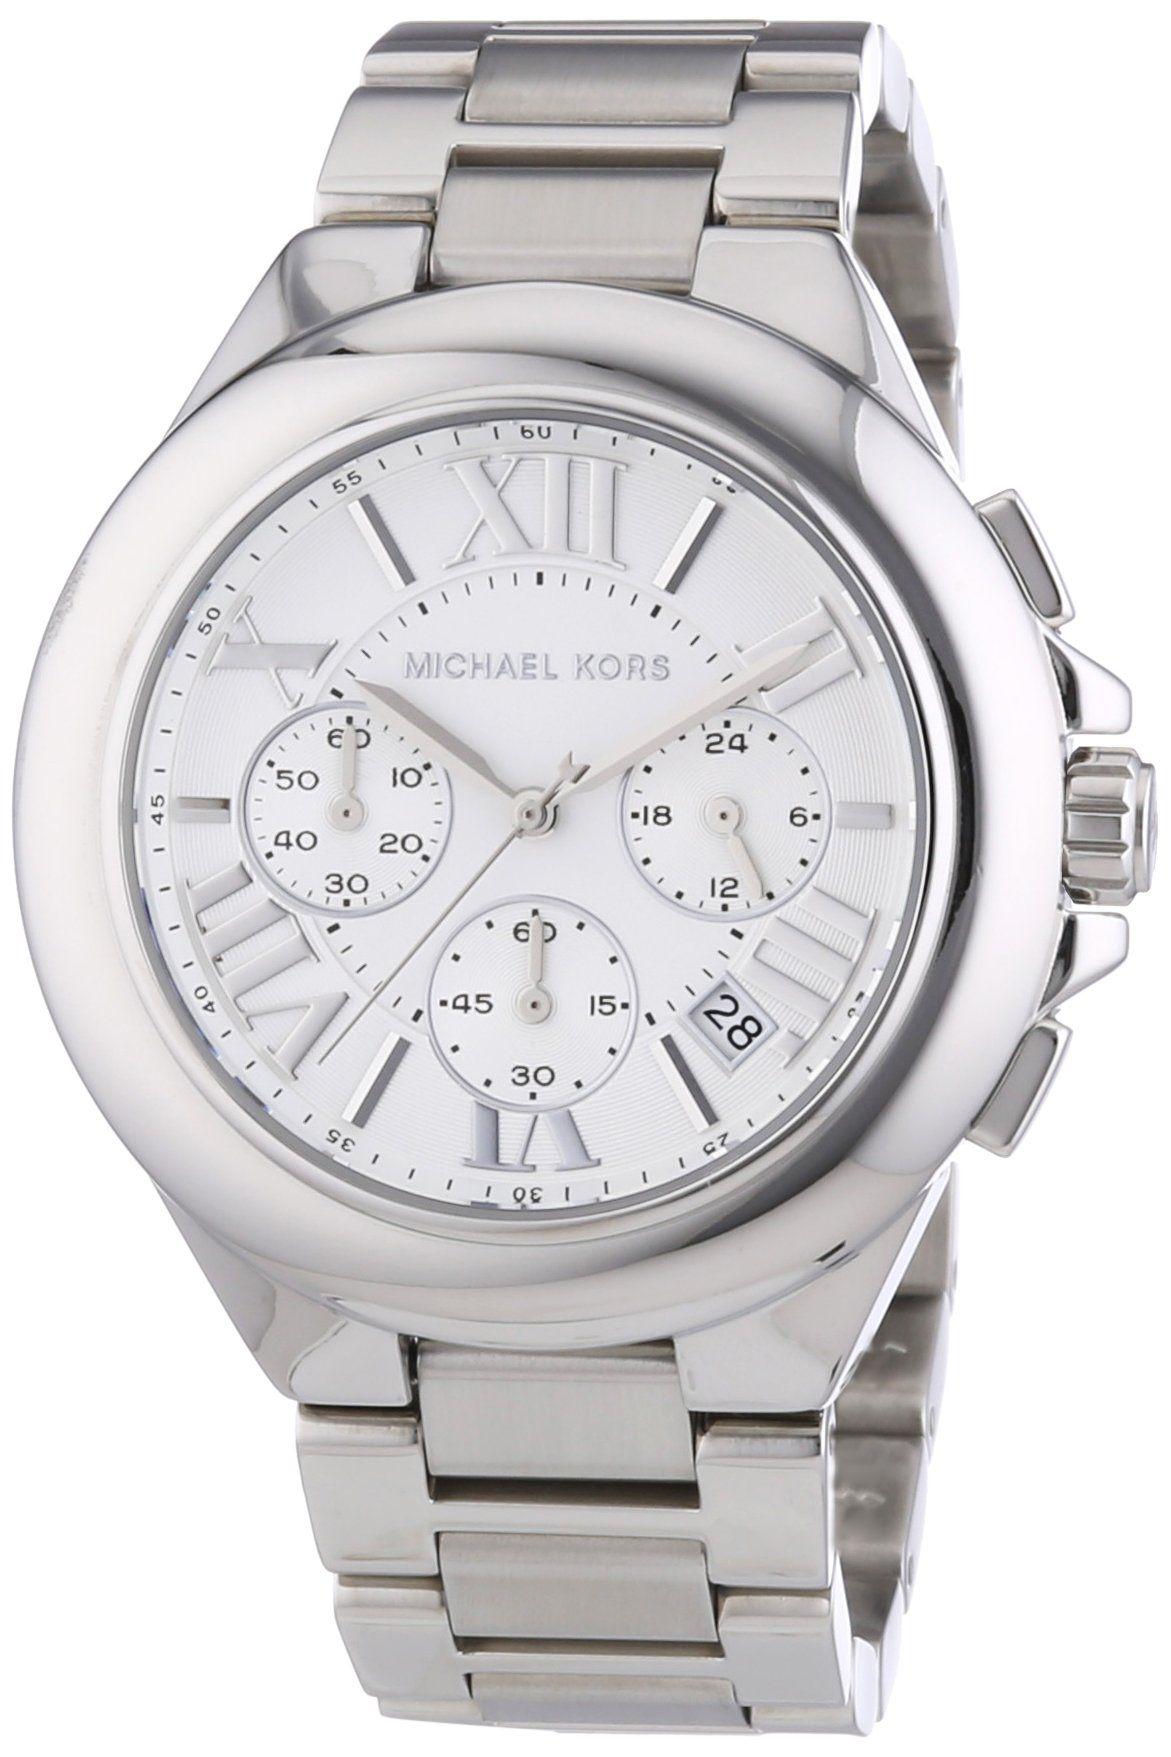 caac244c22e3 Michael Kors MK5719 Women s Chronograph Camille Stainless Steel Bracelet  Silver Watch  Michael Kors  Watches